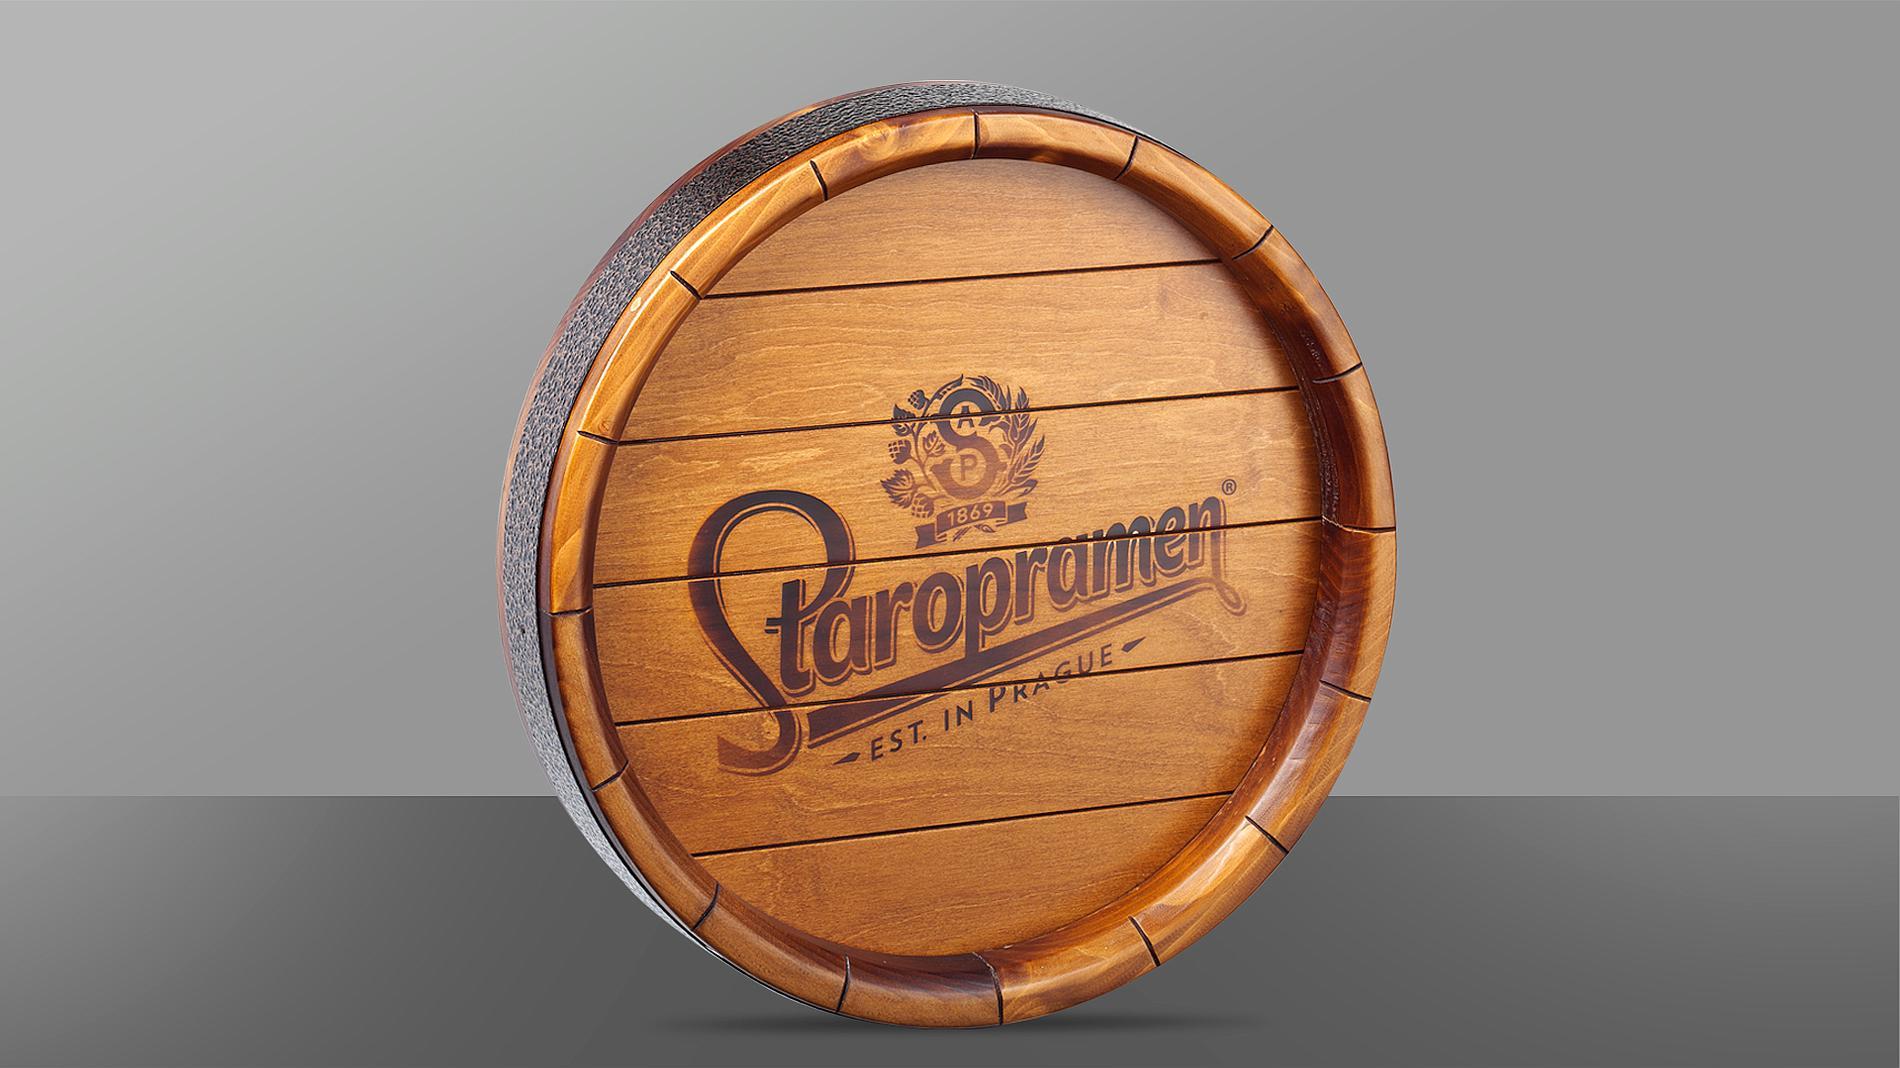 wooden keg Staropramen, POS materials